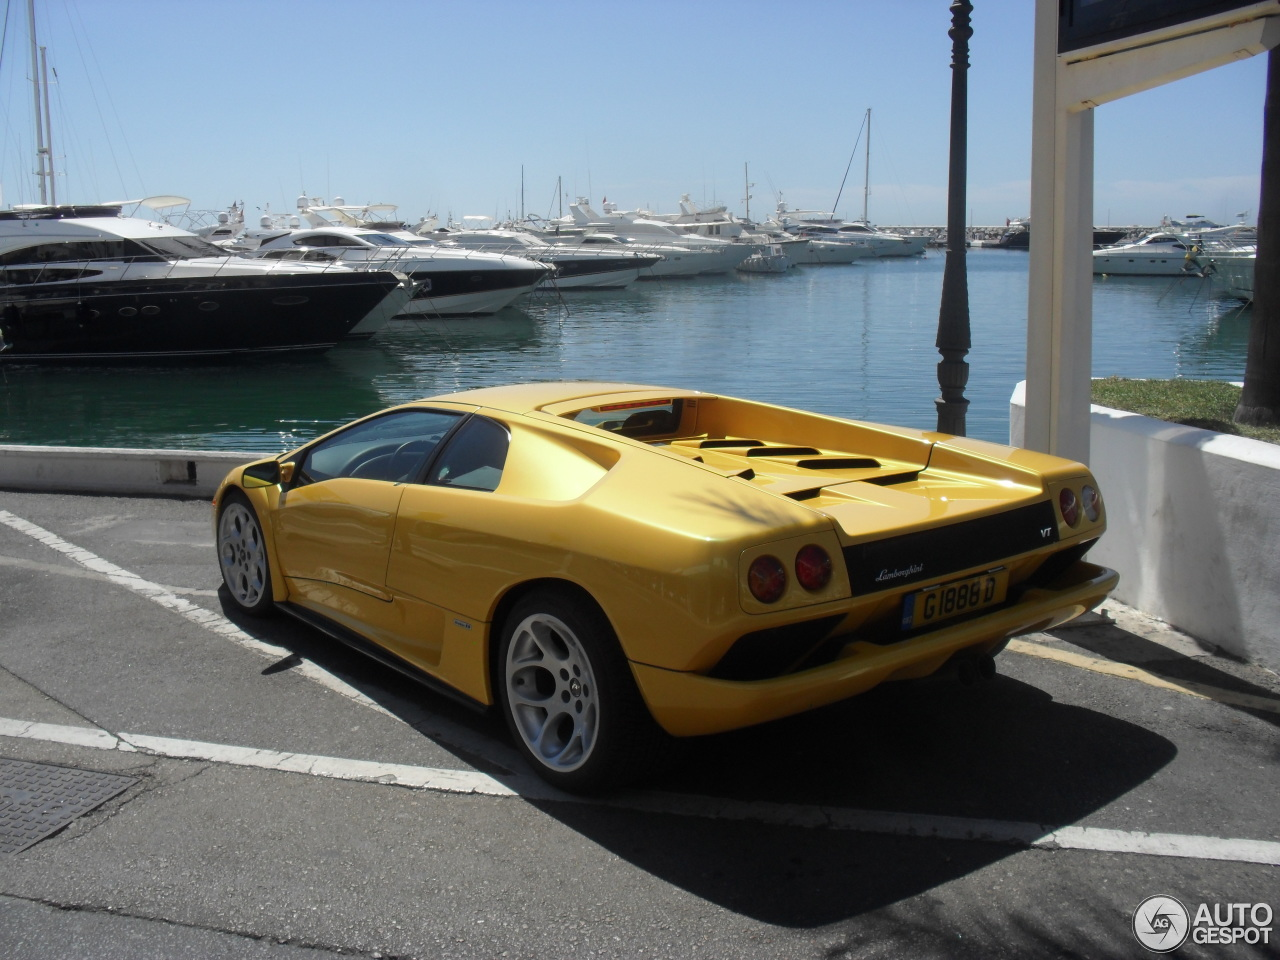 Lamborghini Diablo Vt 6 0 4 May 2016 Autogespot